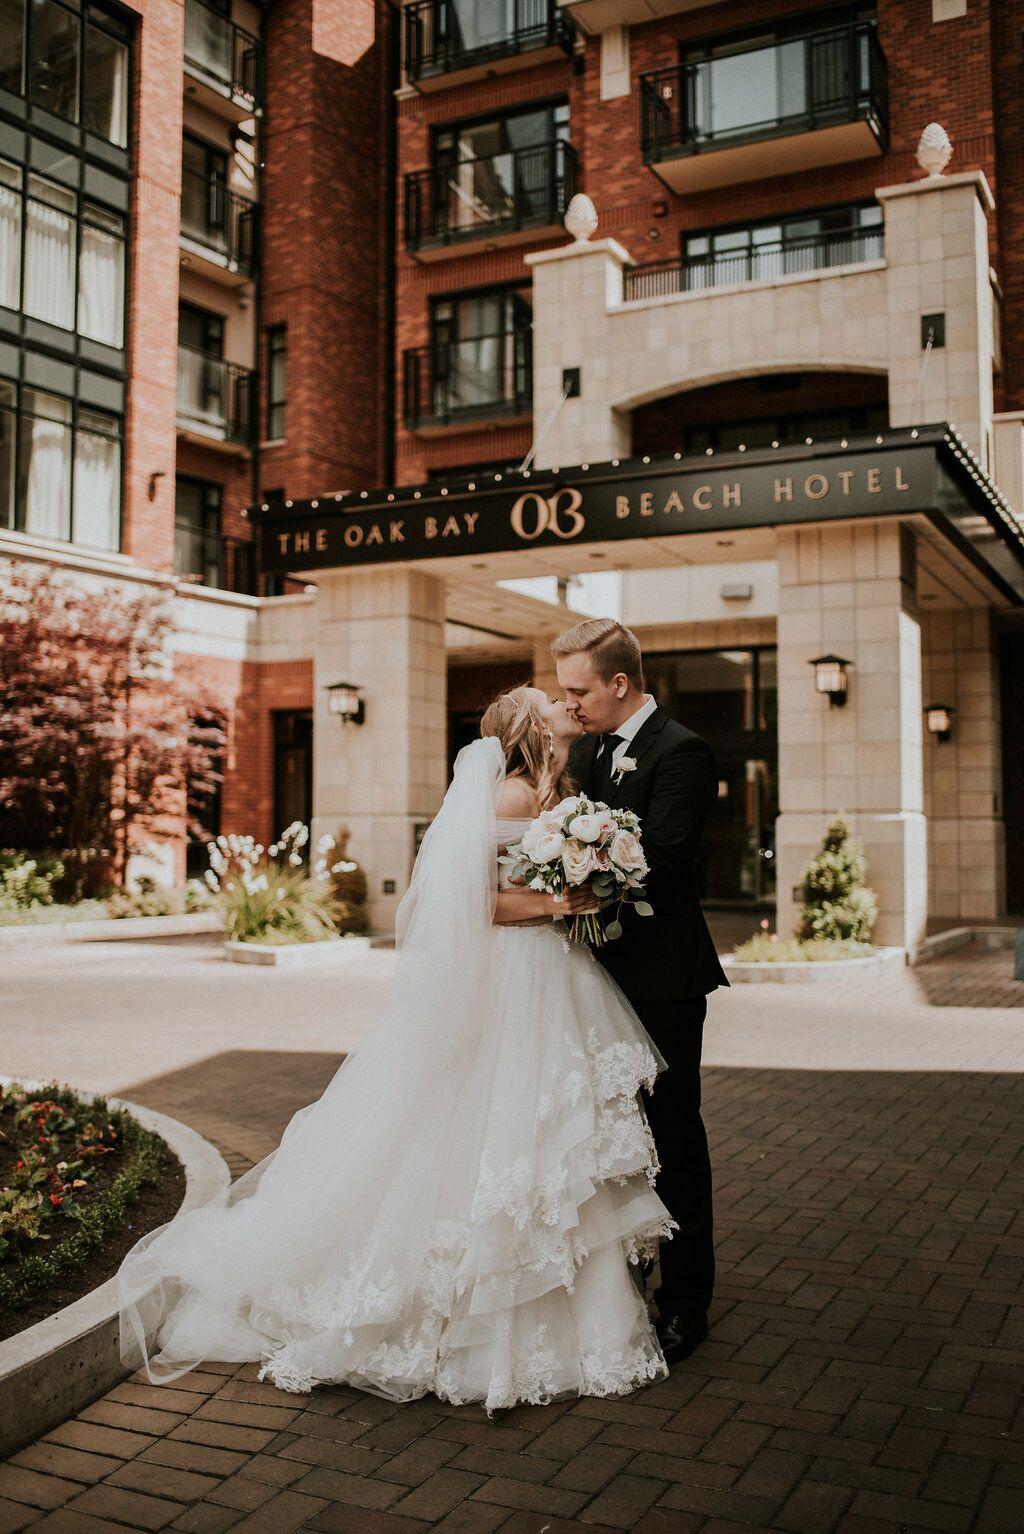 Romantic Newlyweds kiss at front door of Oak Bay Beach Hotel